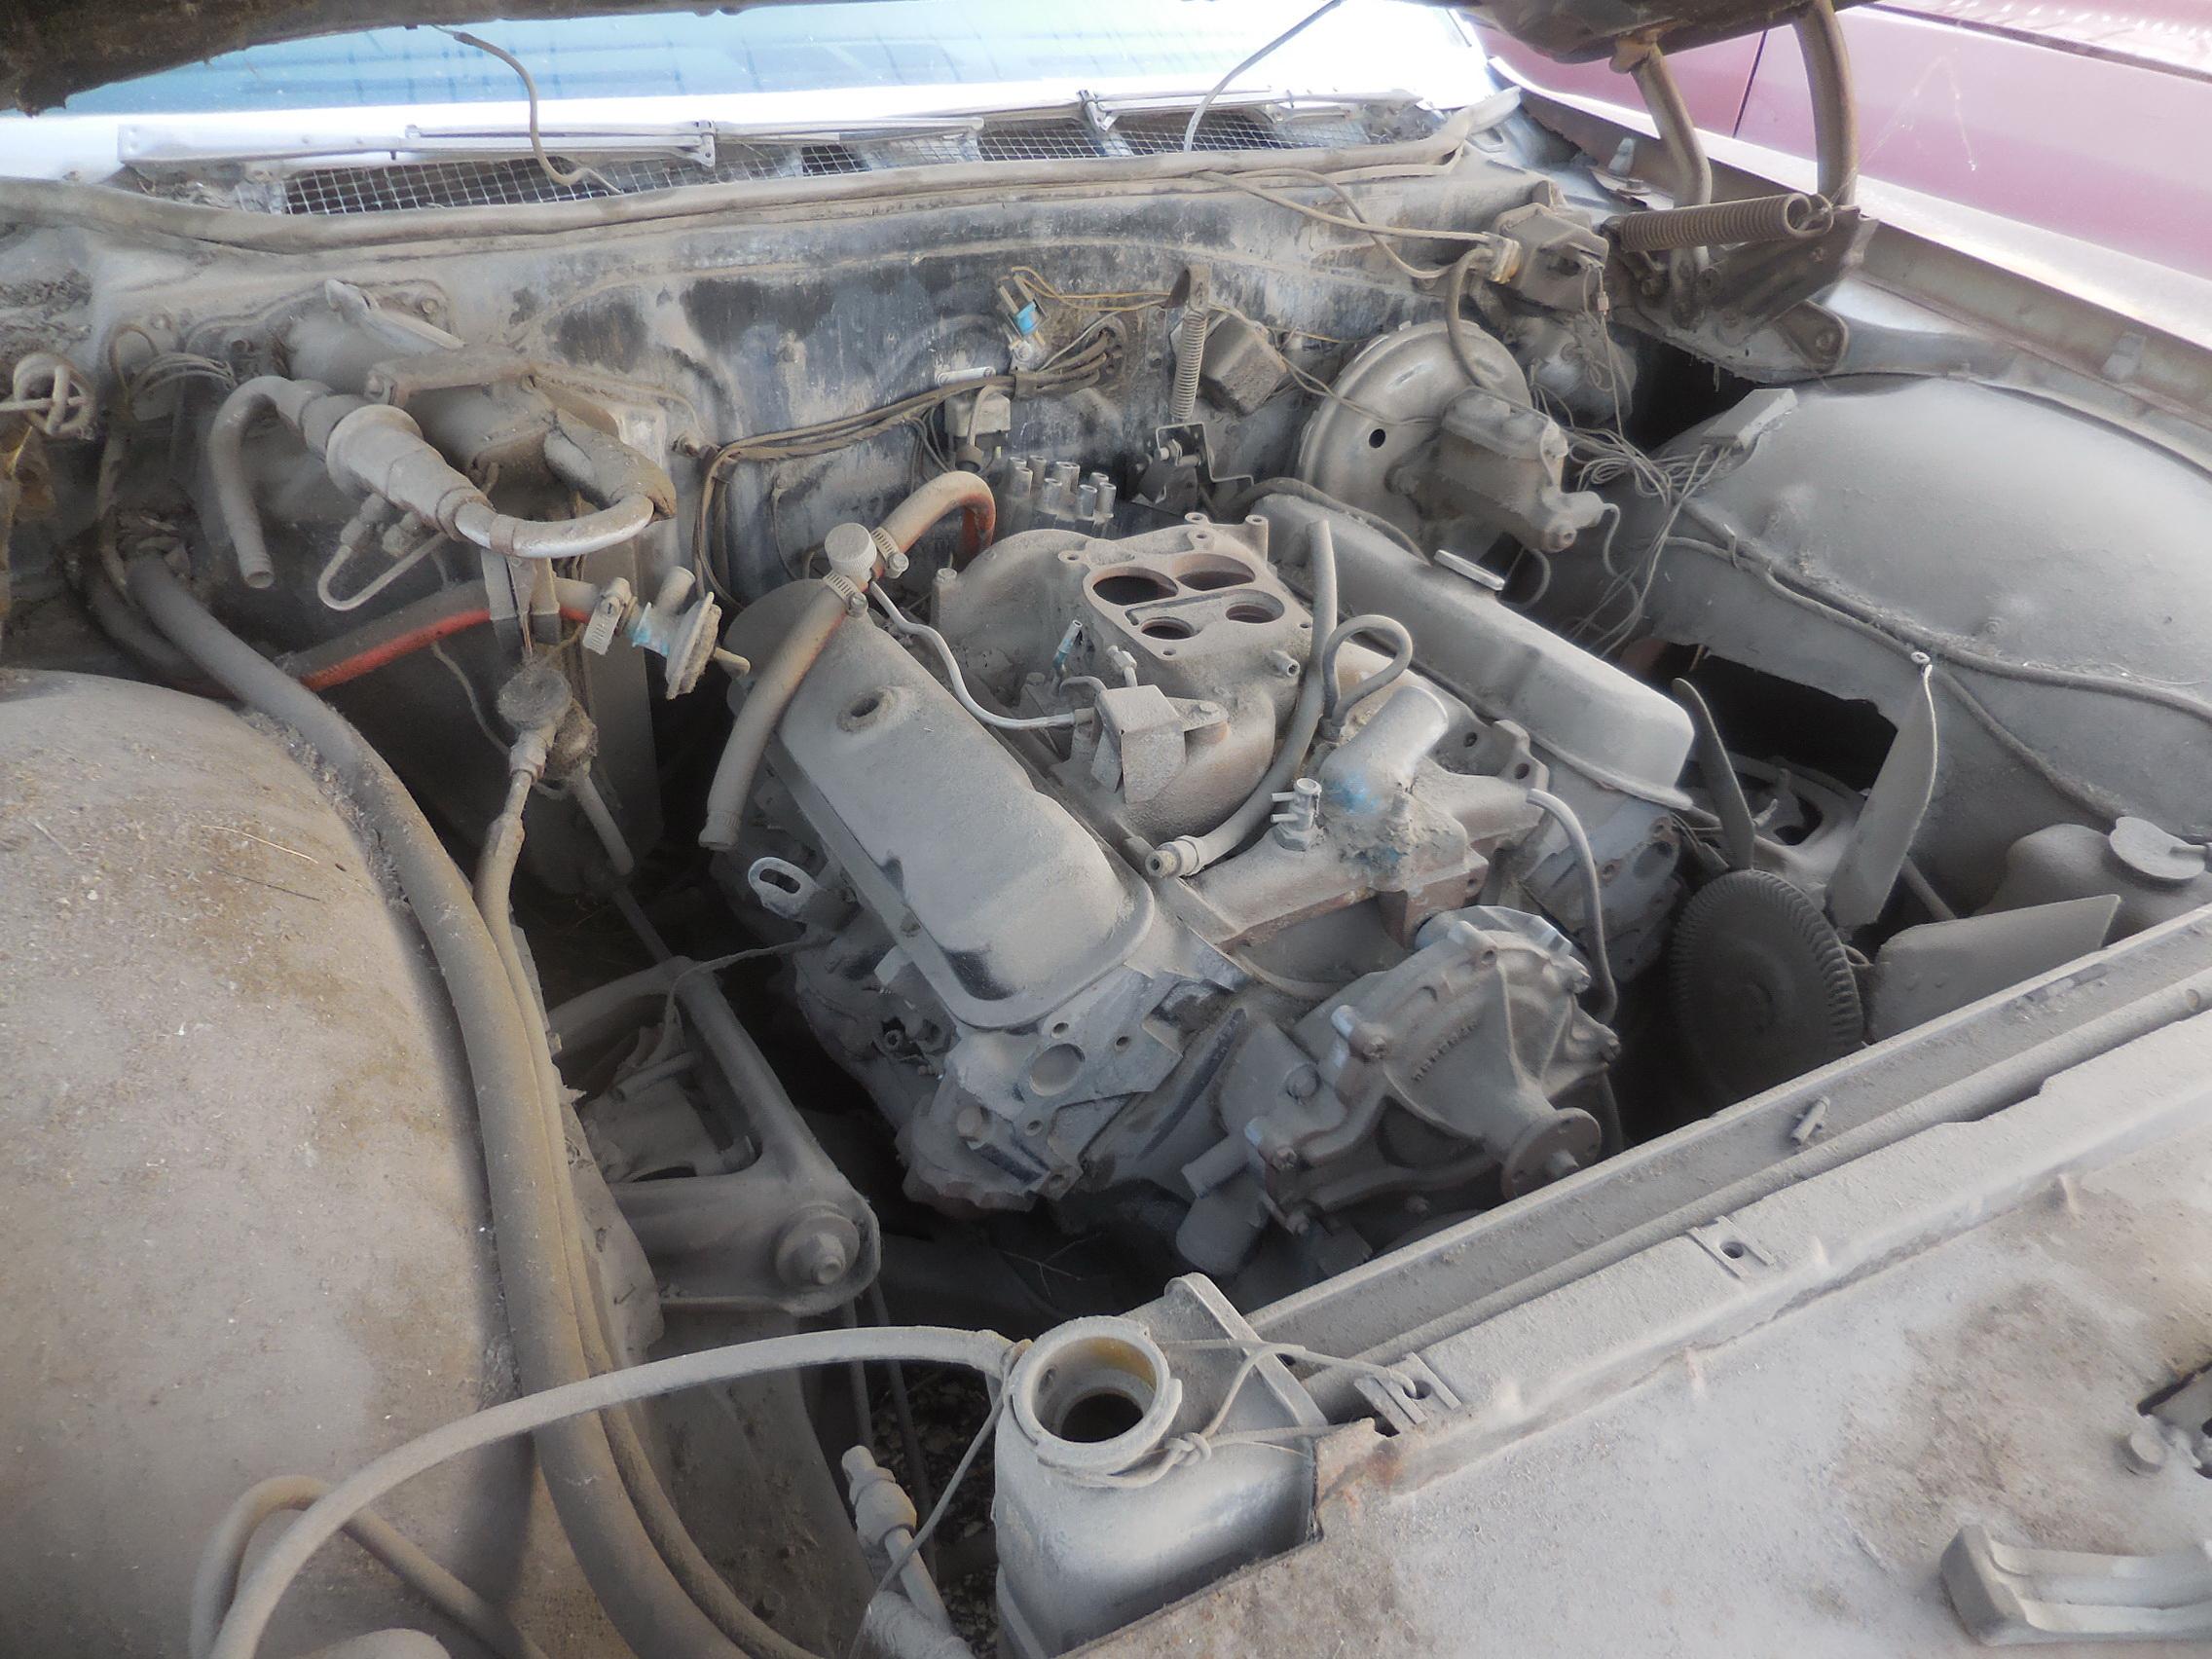 Pontiac 400 Gamble Or Wishful Thinking The Forums Big Block Engines